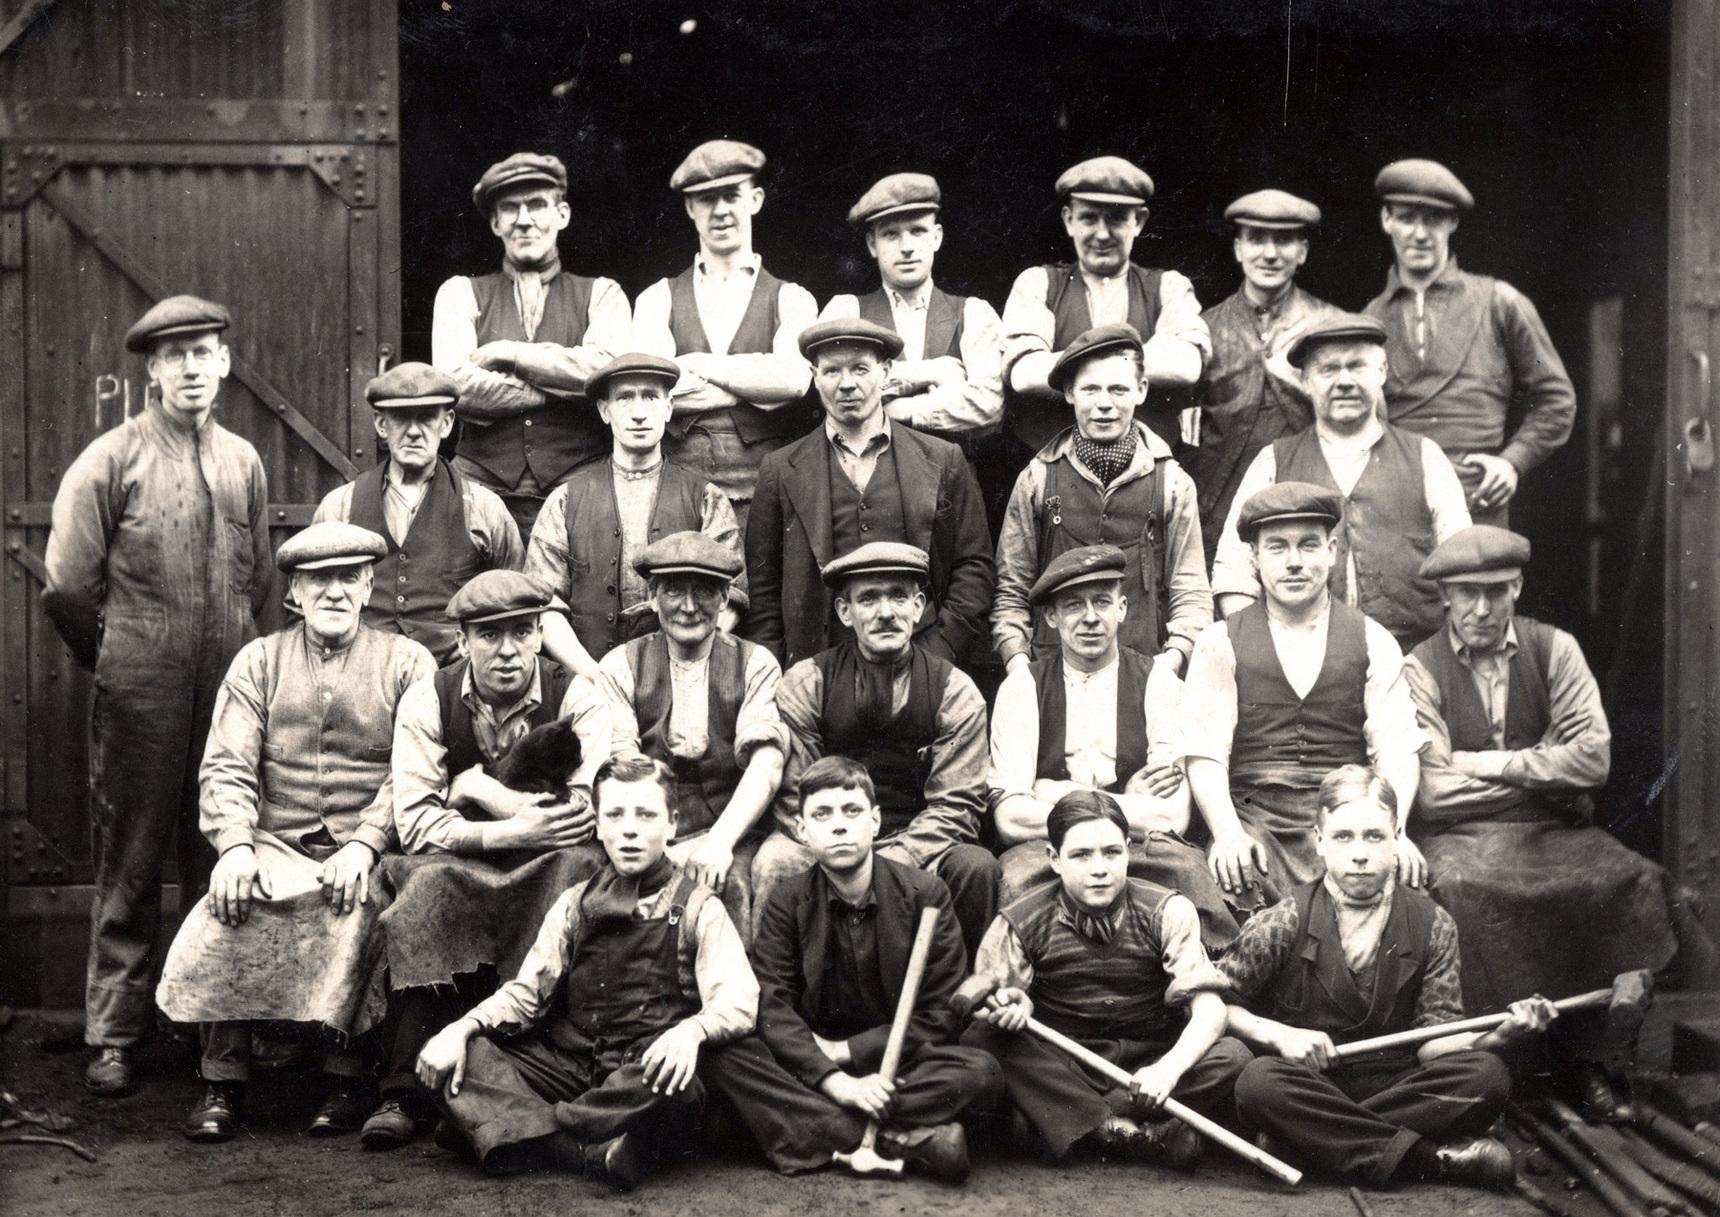 Workmen Of Unidentified Occupation 1910s